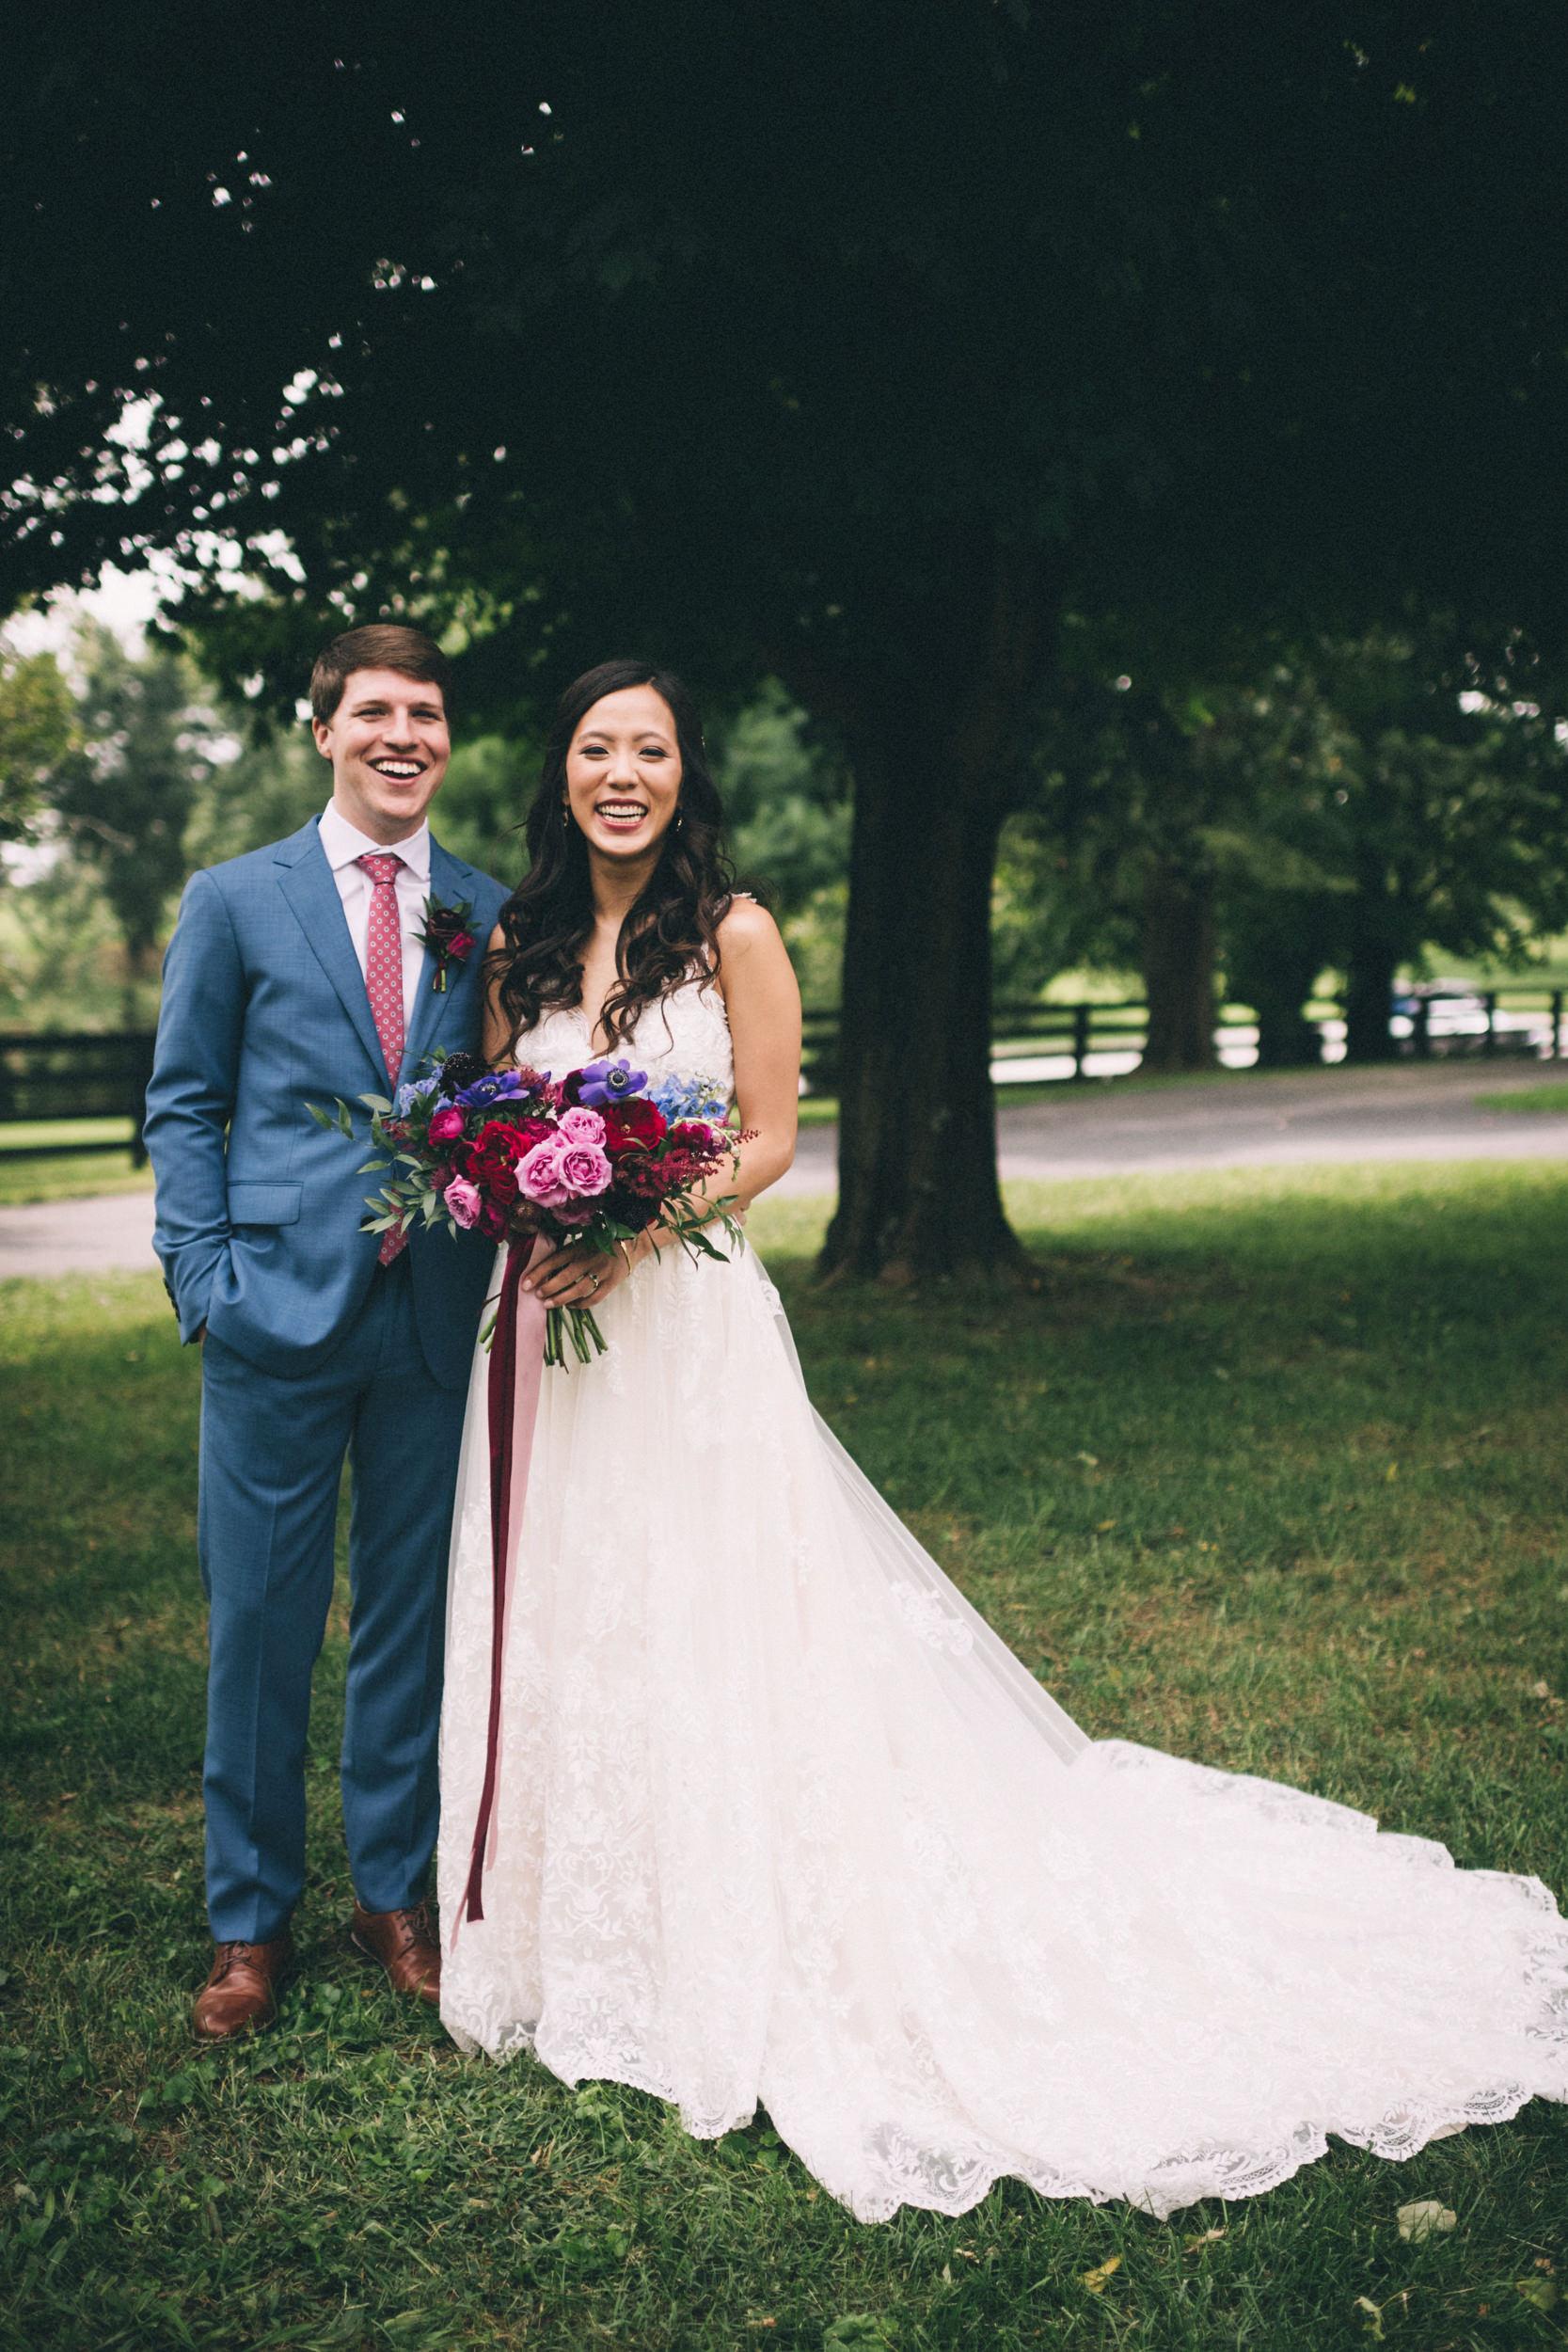 Louisville-Kentucky-Wedding-and-Elopement-Photographer-Sarah-Katherine-Davis-Photography-Summer-Jewel-Toned-Wedding-Chineese-Tea-Ceremony-Warrenwood-Manor-Danville-182.jpg